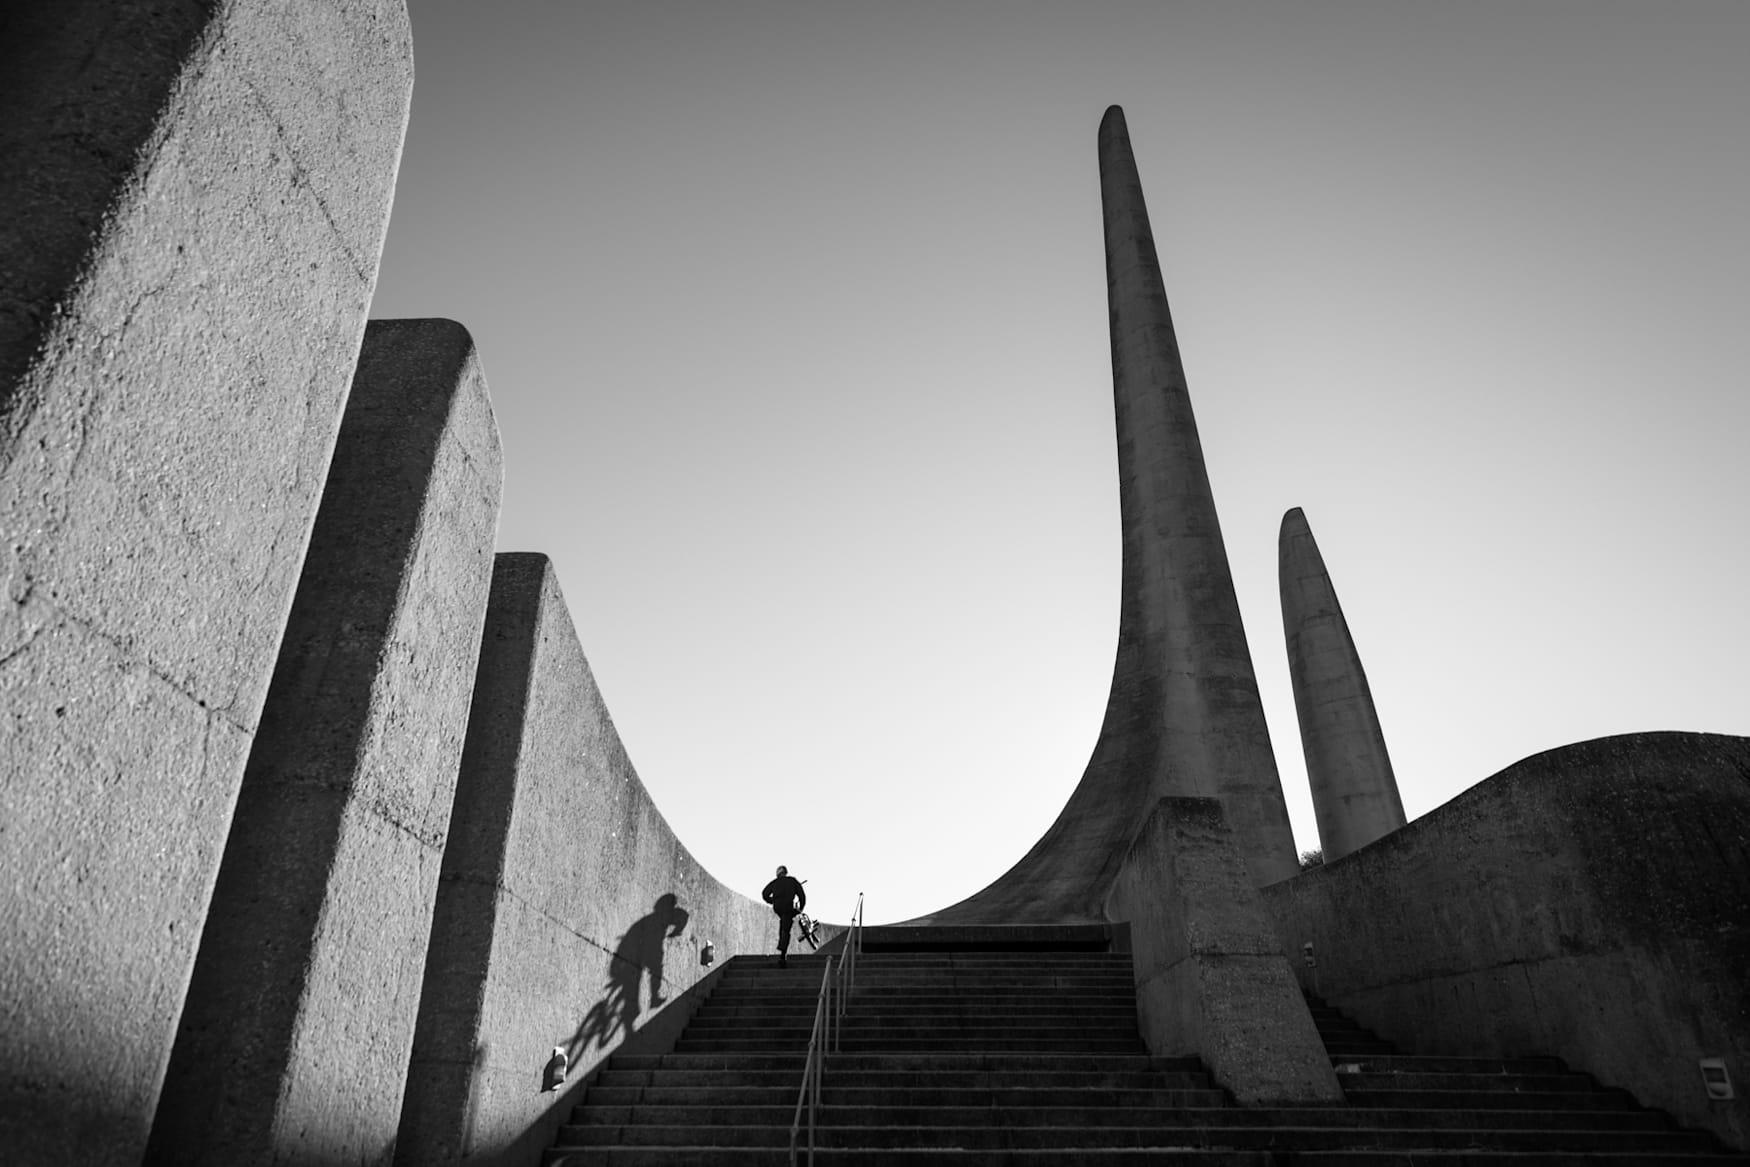 Murray Loubser en el Afrikaans Language Monument en Paarl Town, Sudáfrica.